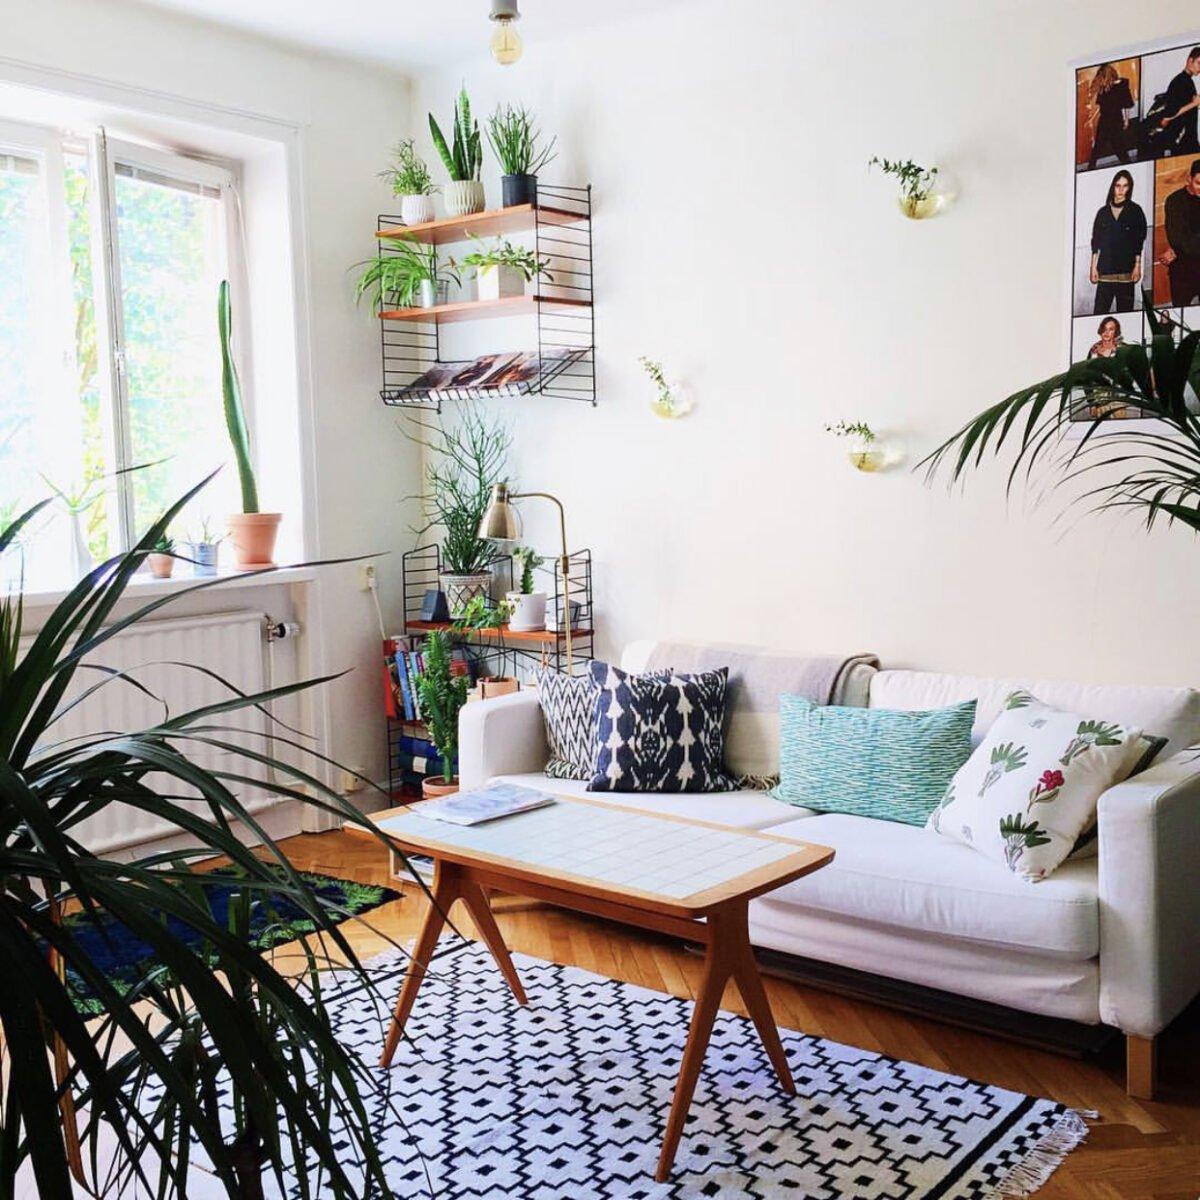 arredare-casa-airbnb-4